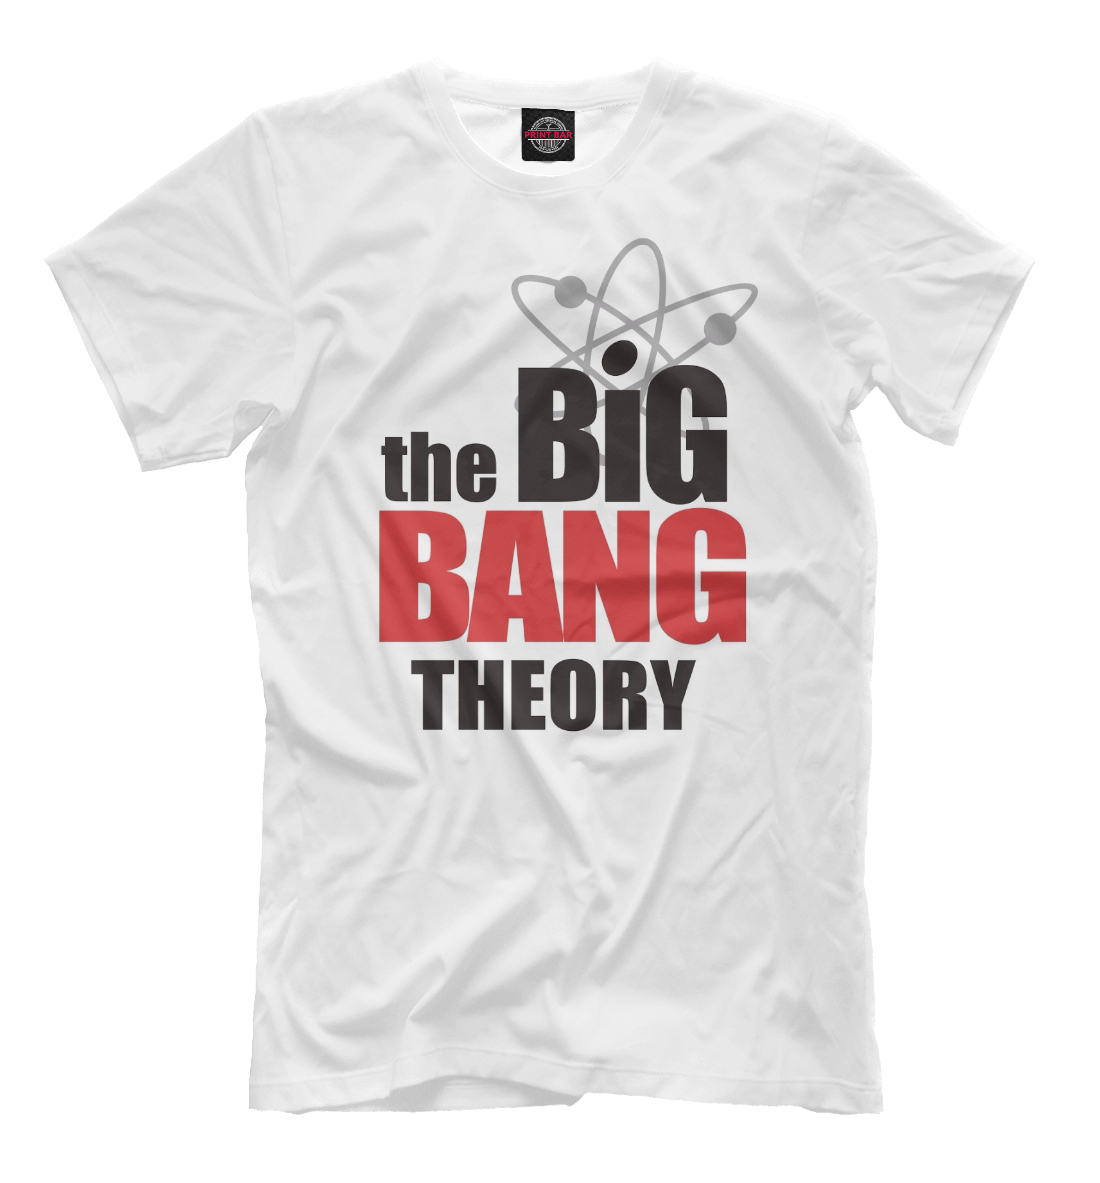 Купить The Big Bang Theory, Printbar, Футболки, TEO-602107-fut-2